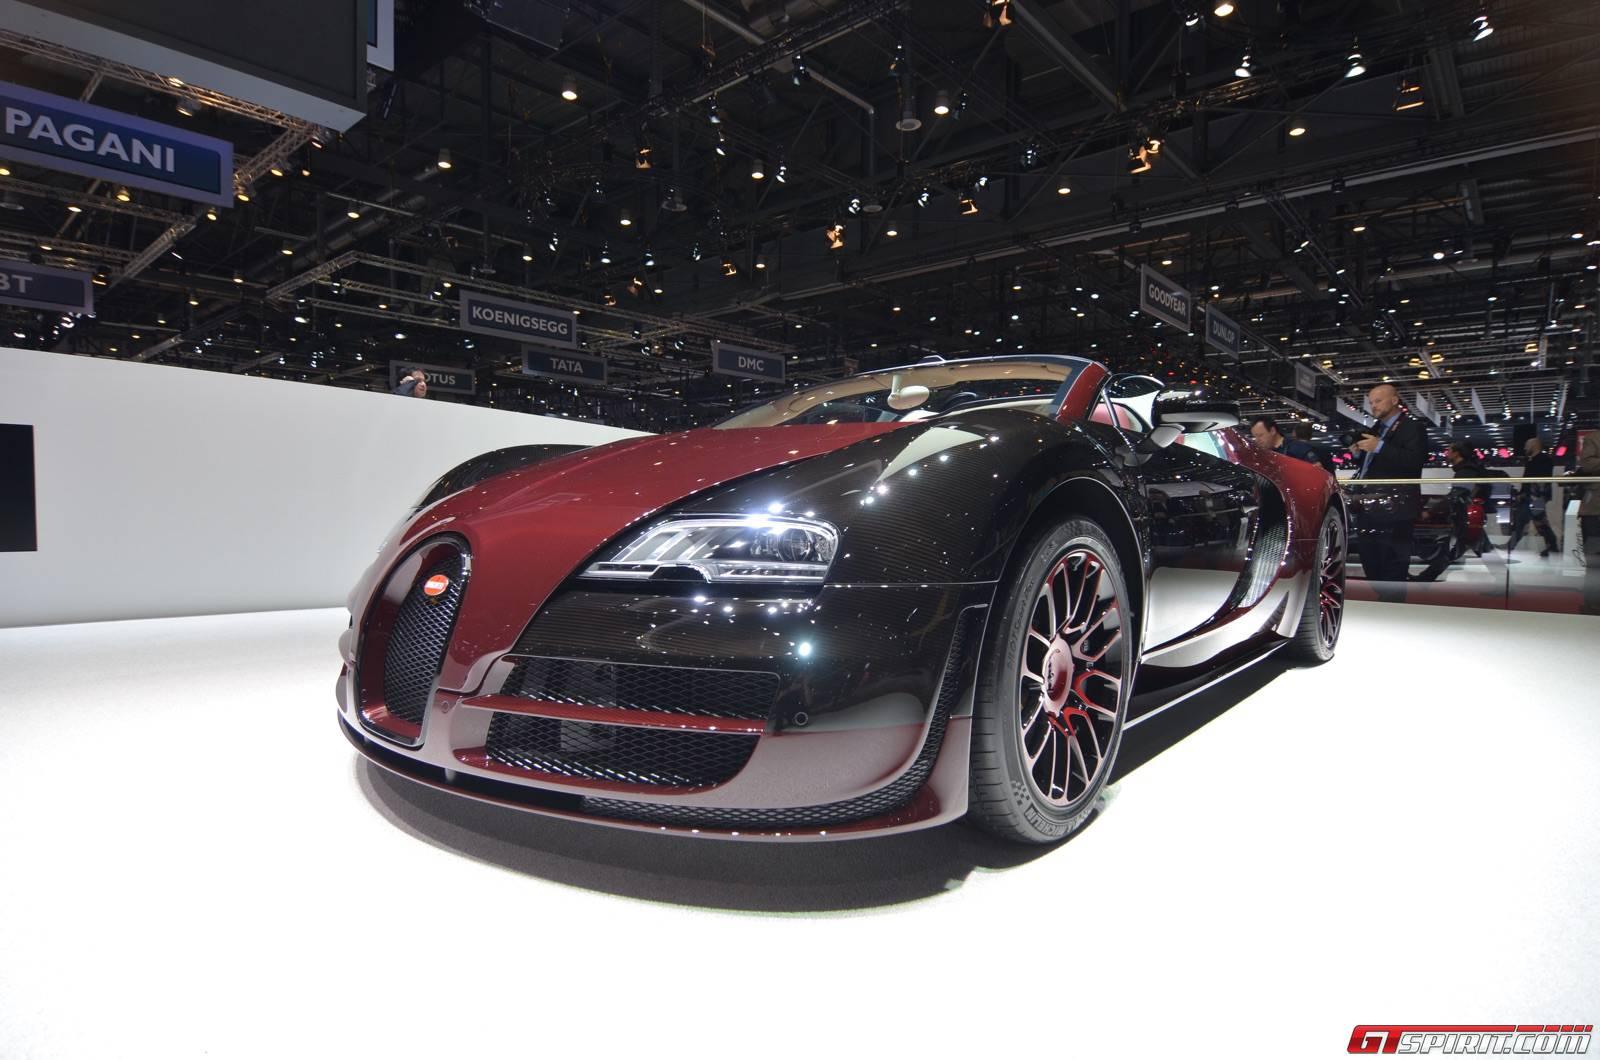 geneva 2015 bugatti veyron grand sport vitesse la finale gtspirit. Black Bedroom Furniture Sets. Home Design Ideas